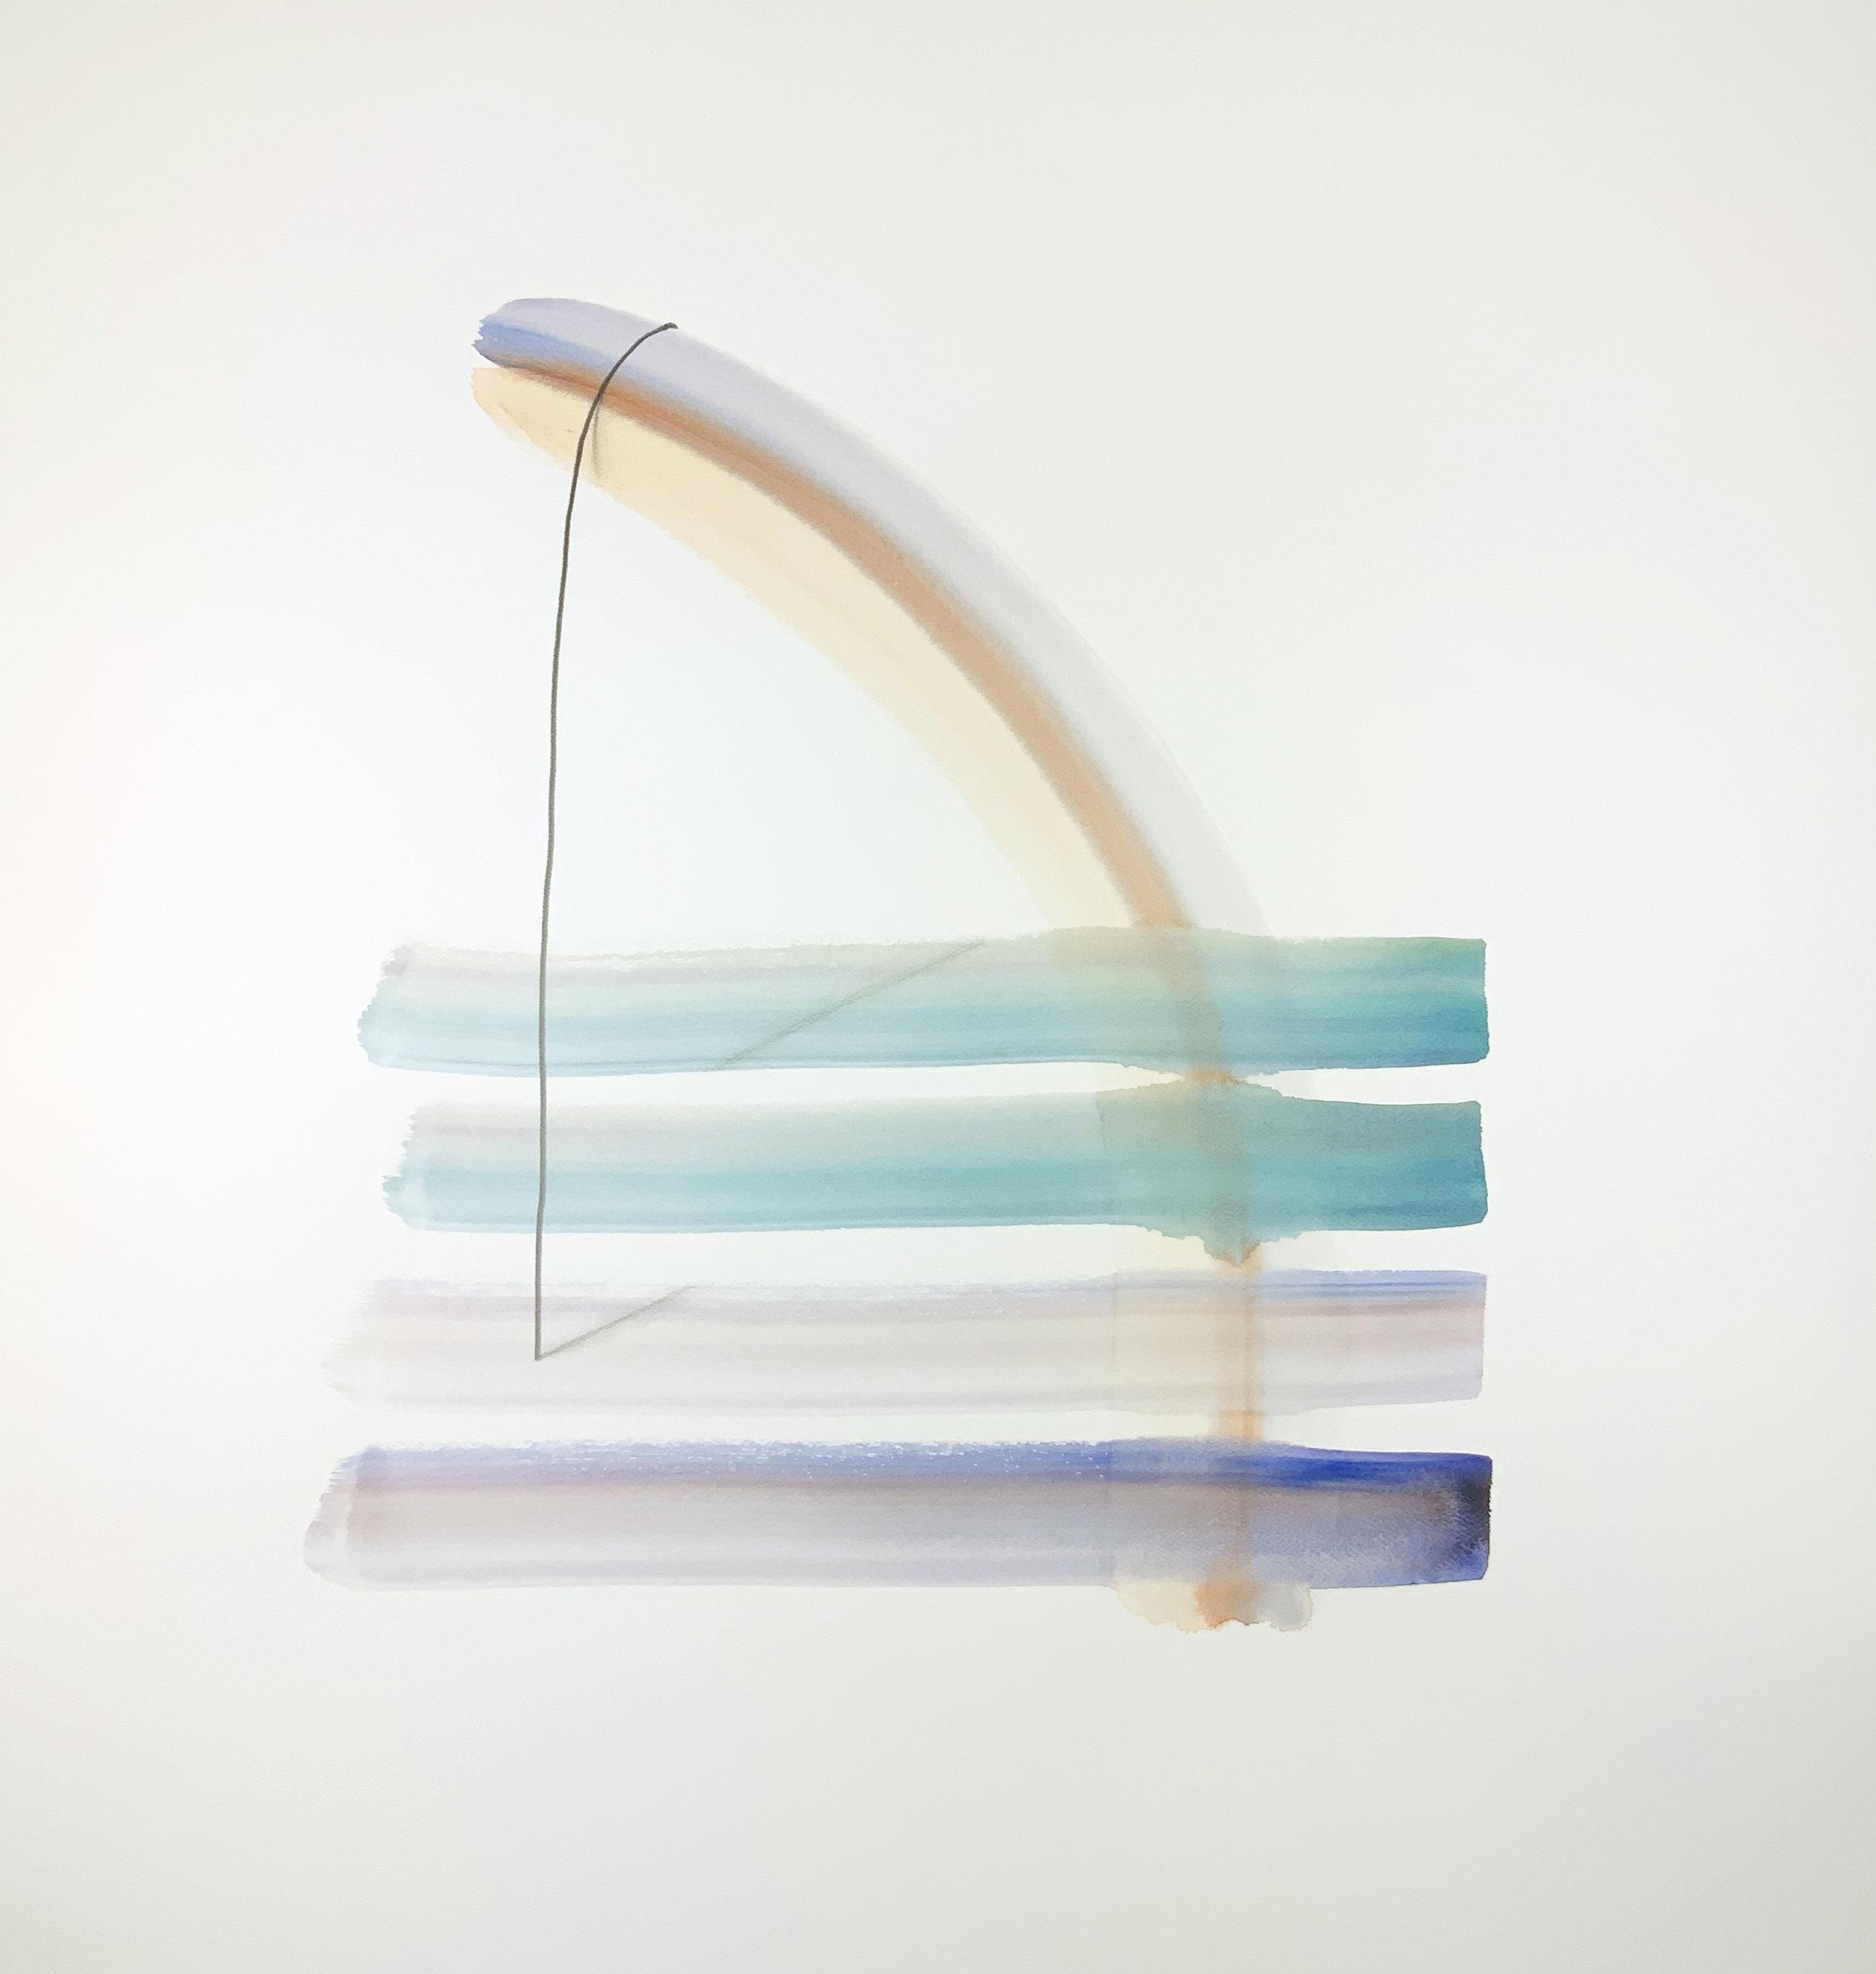 AdahRoseG Wesley Berg Untitled W020  2019 Gouache and Graphite on Paper 23x22 unframed 1000.jpg